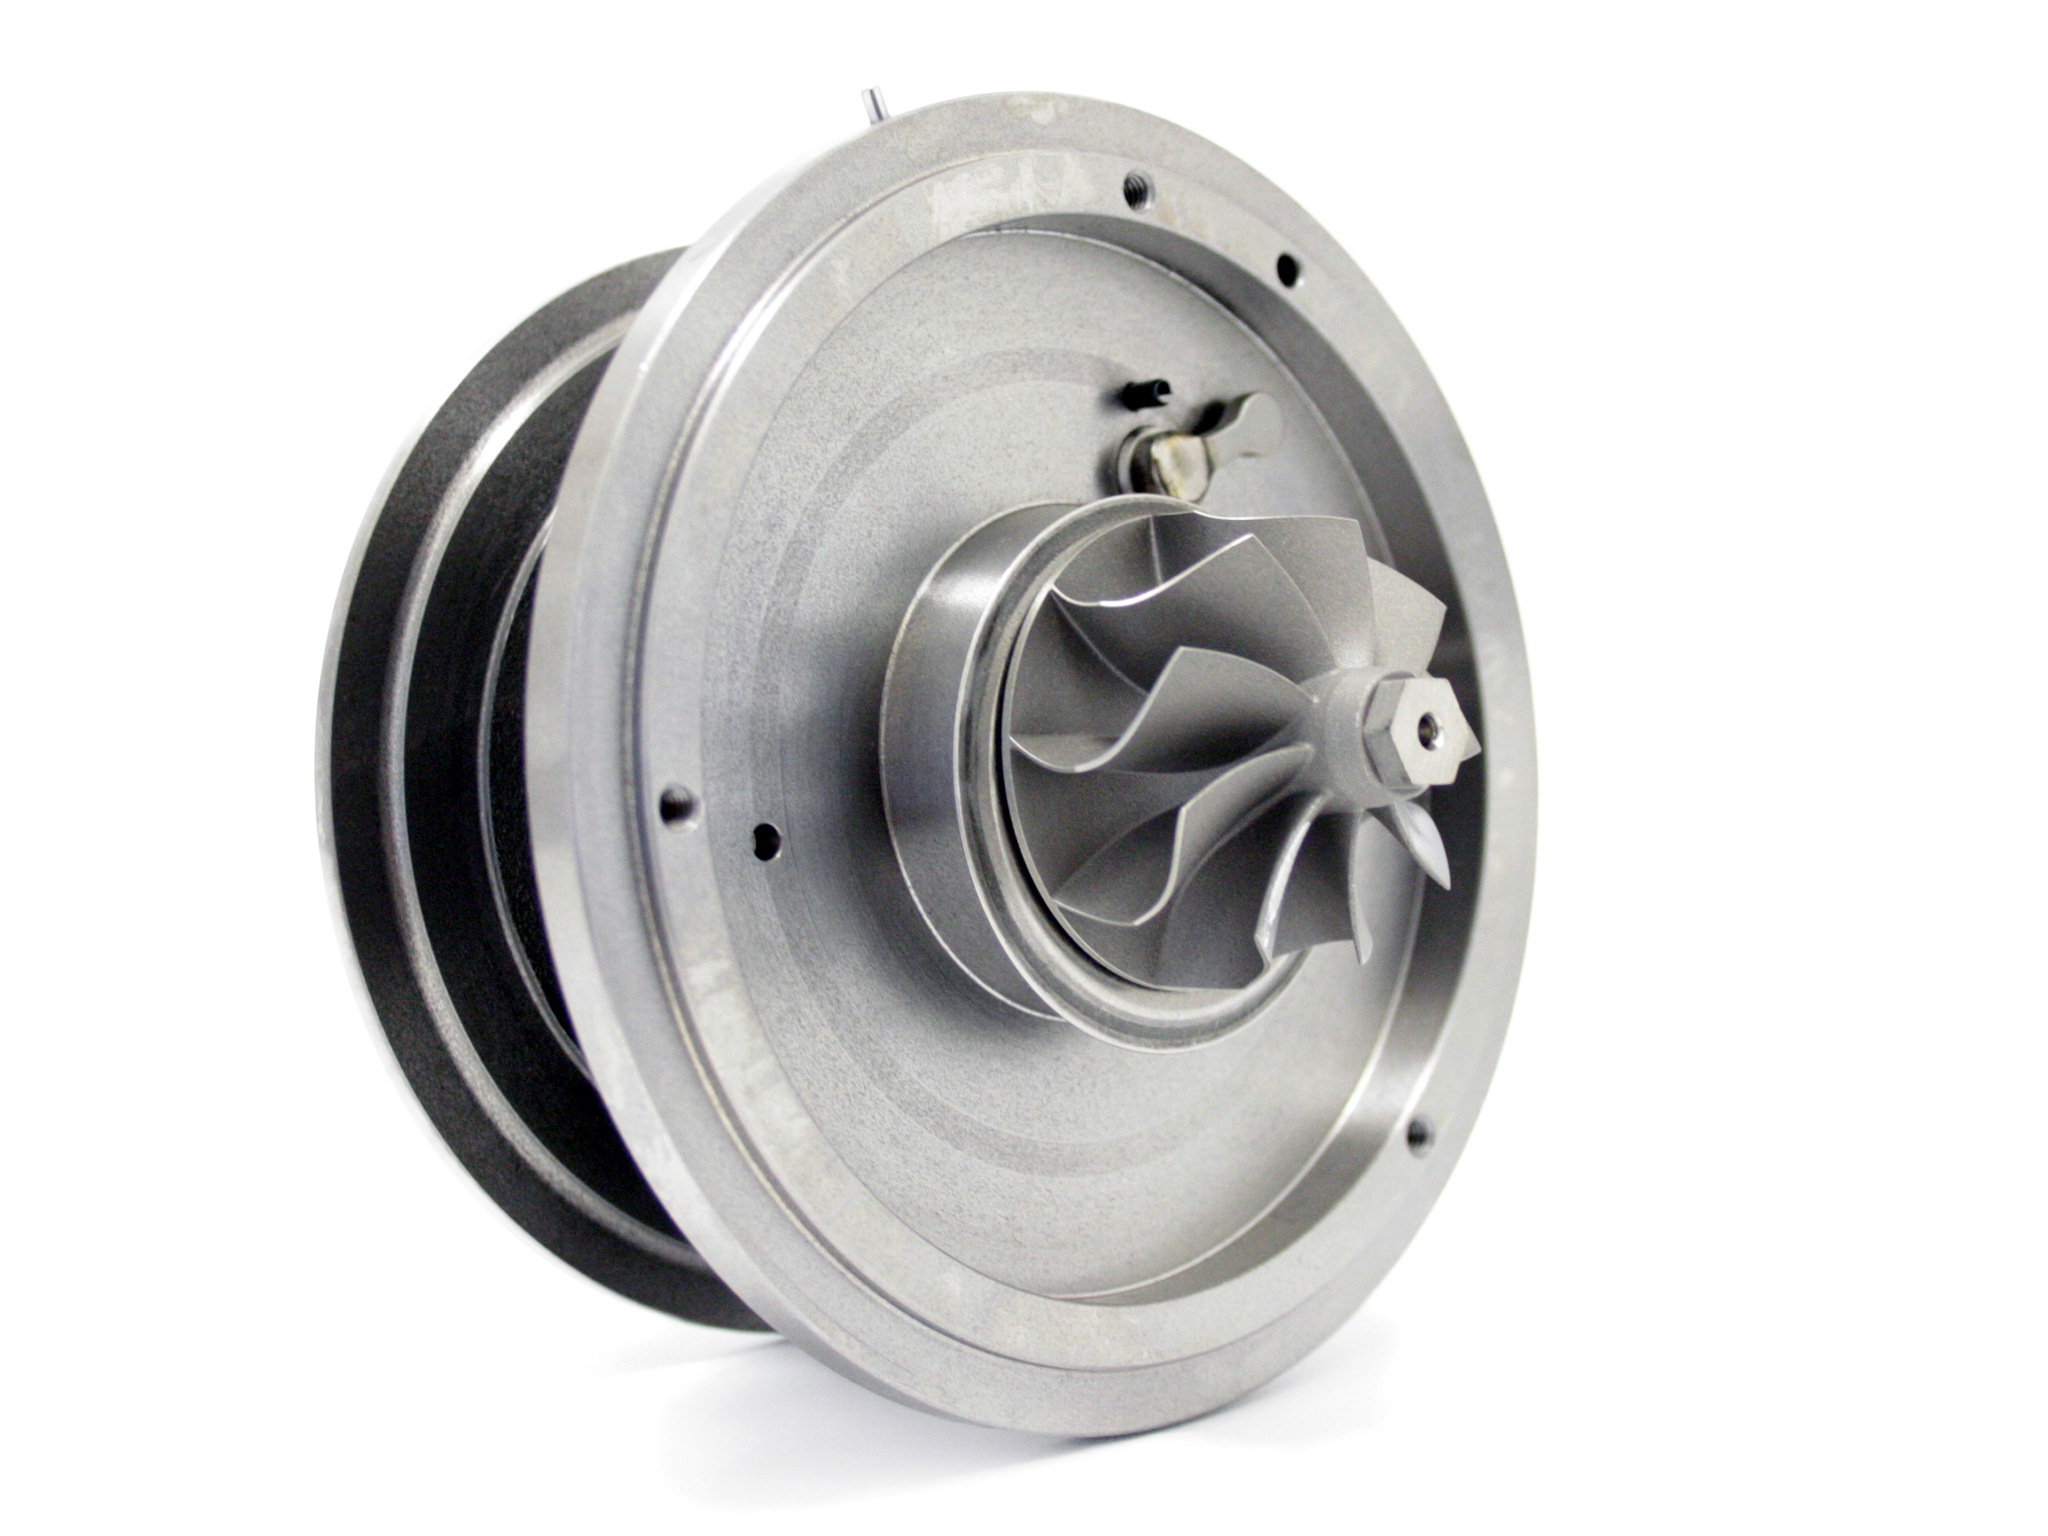 Картридж турбины GTB1749VK Лэнд Ровер 3.0 TDV6 211 / 245 л.с. (левый)